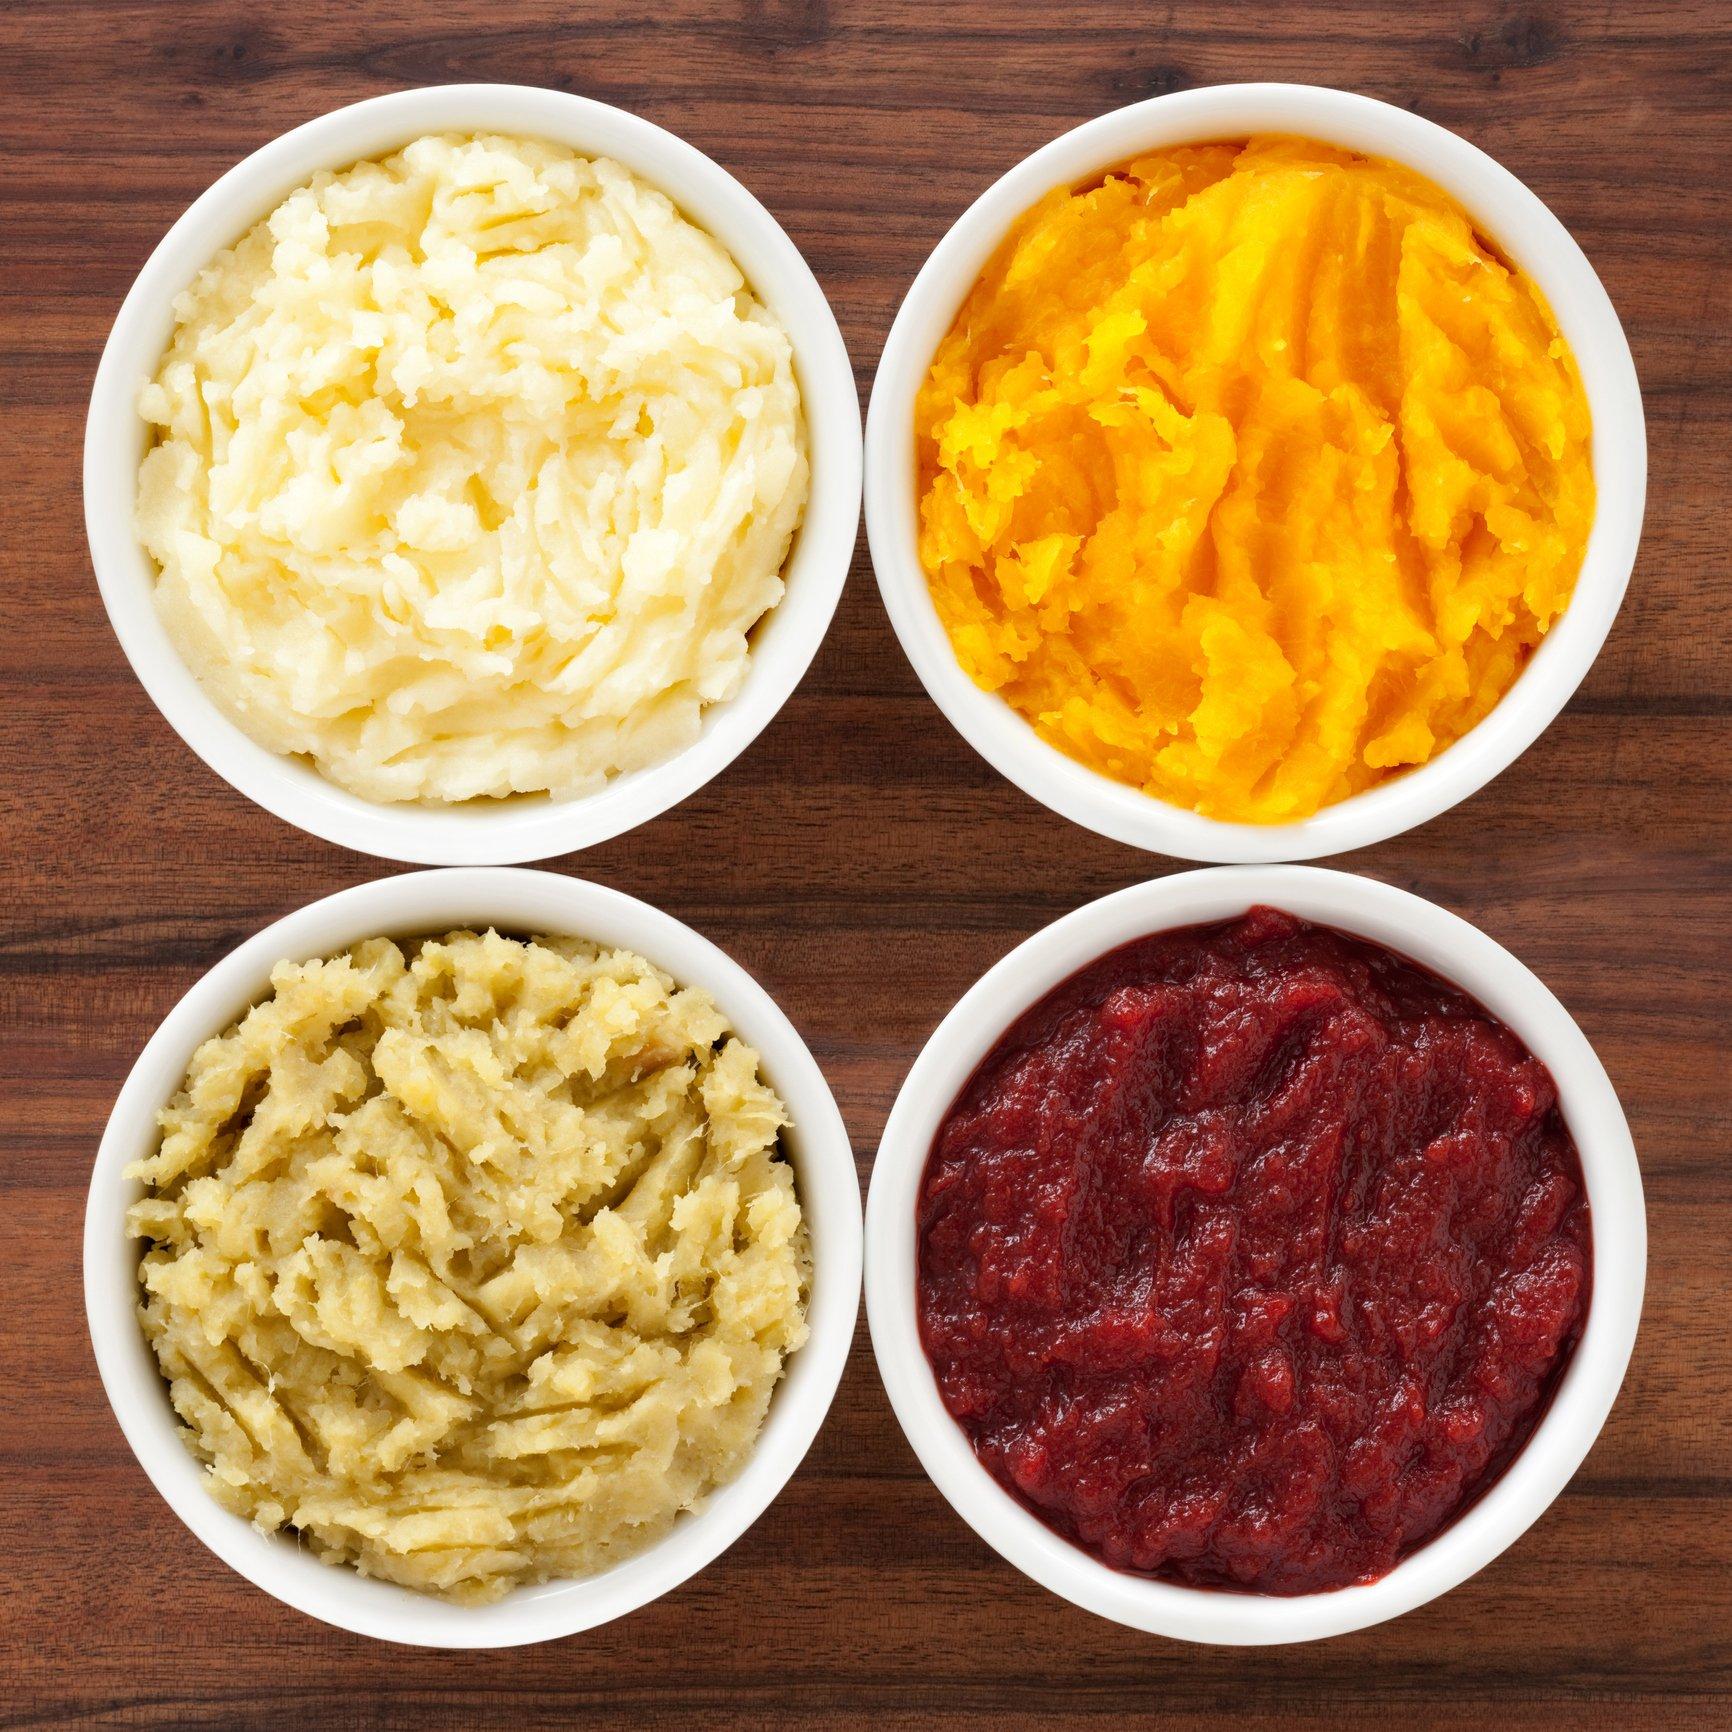 From top left, clockwise: Potato, sweet potato, beet and squash mash. (iStock Photo)